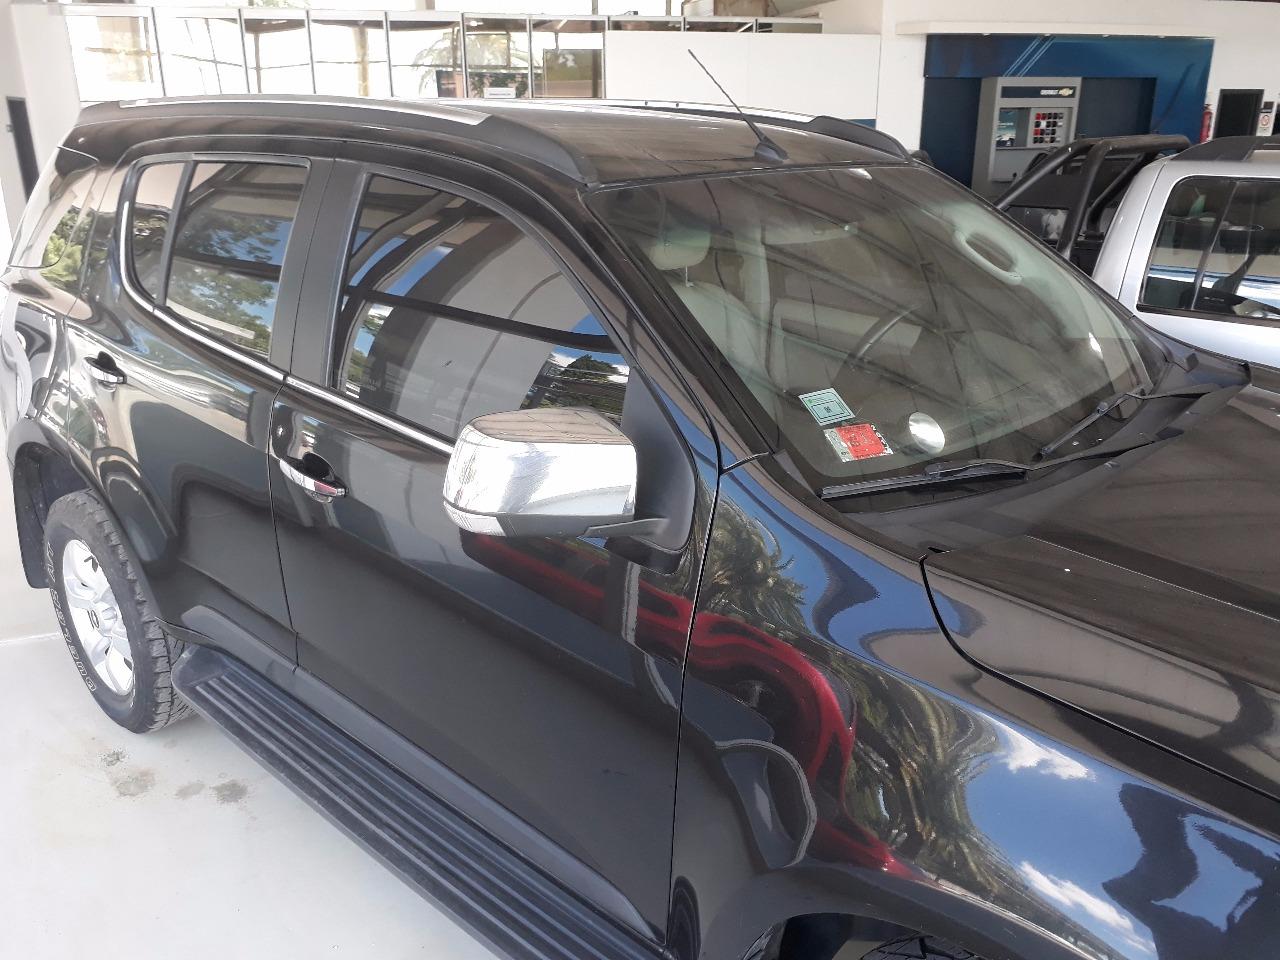 2013 Chevrolet Trailblazer LTZ 1,4L